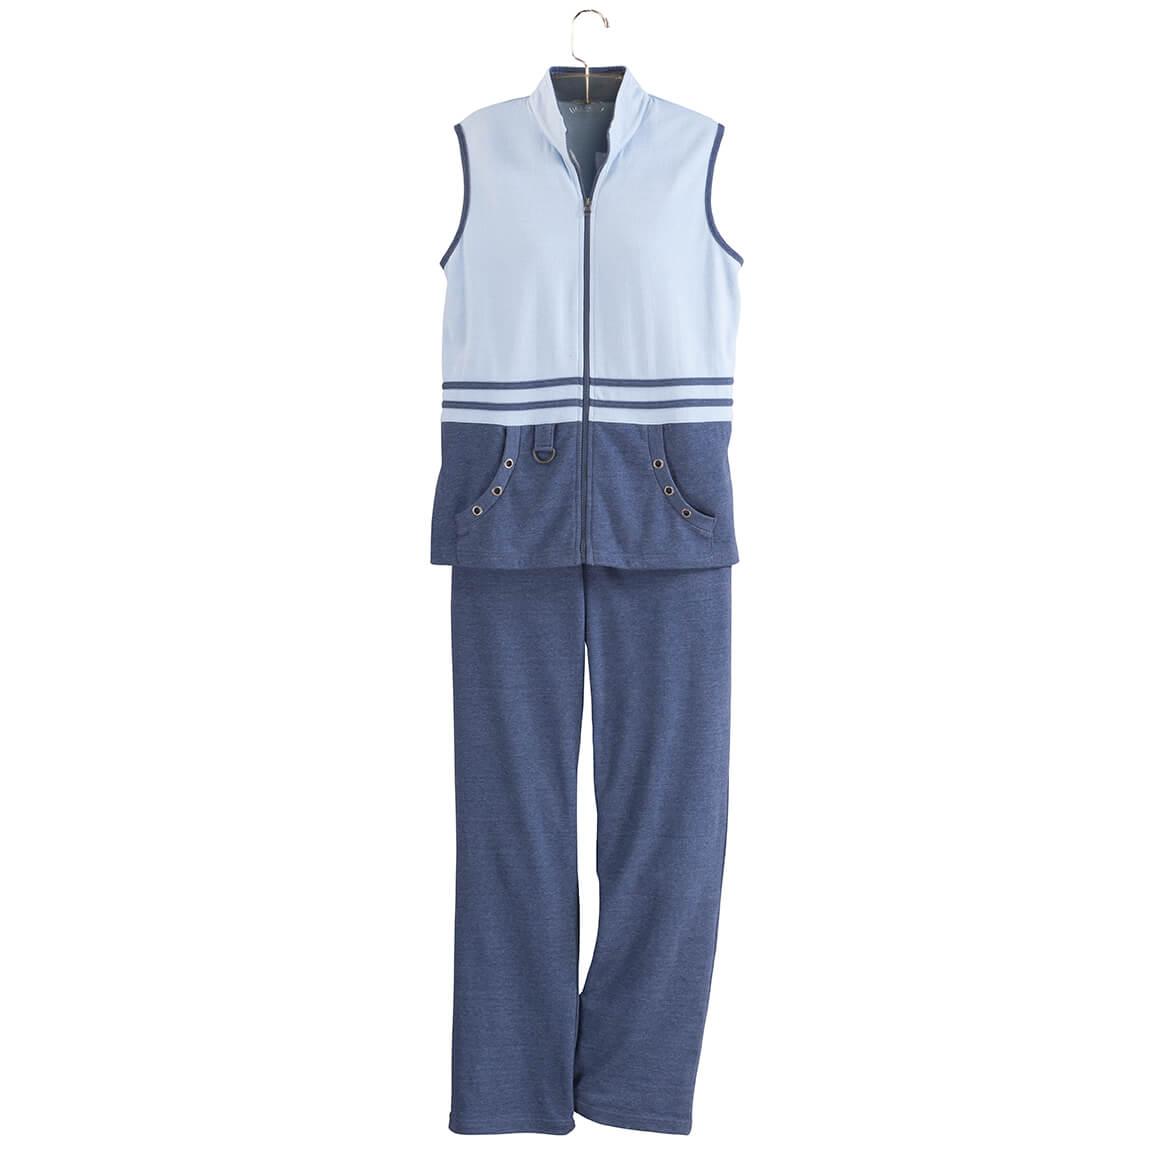 2 Piece Vest and Pant Set by Sawyer Creek-365509